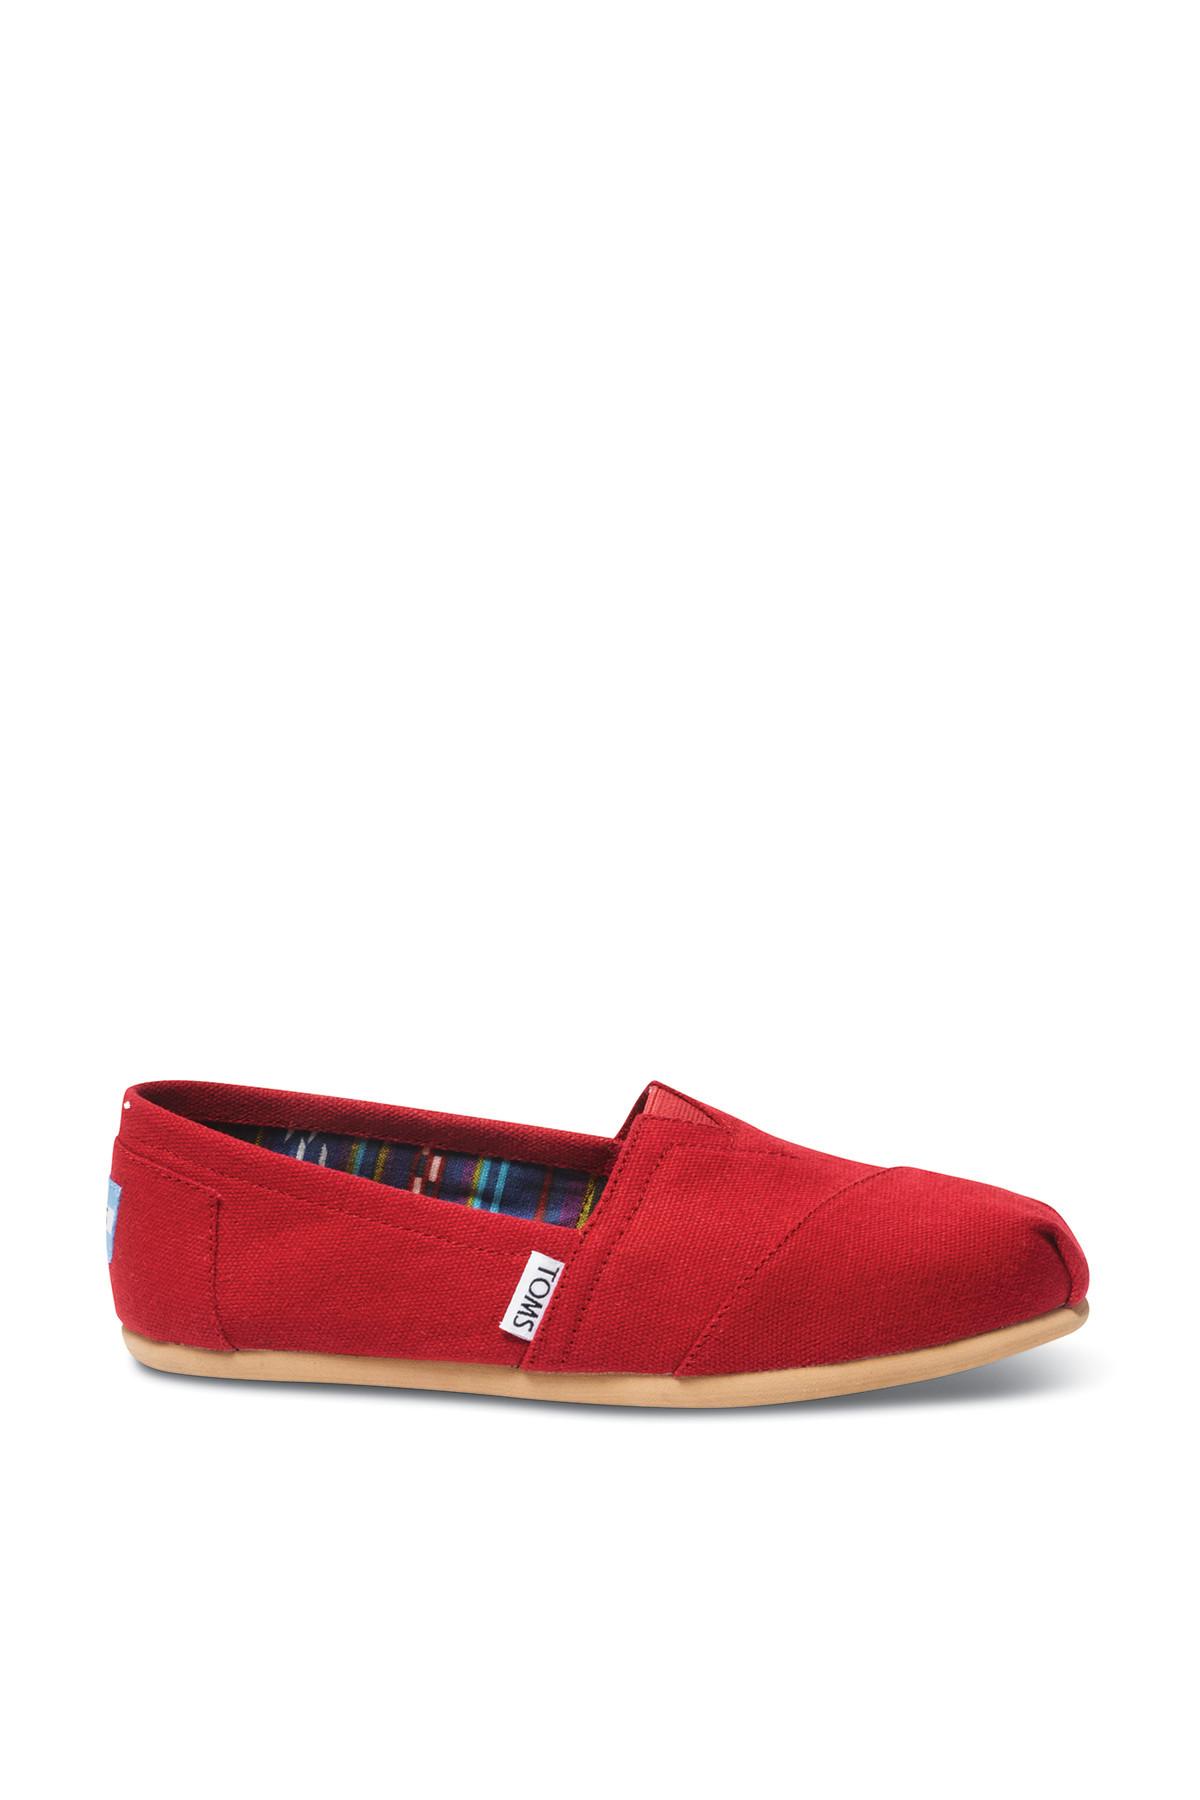 Kadın Casual Ayakkabı -Red Canvas Wm Clsc Alprg Nl